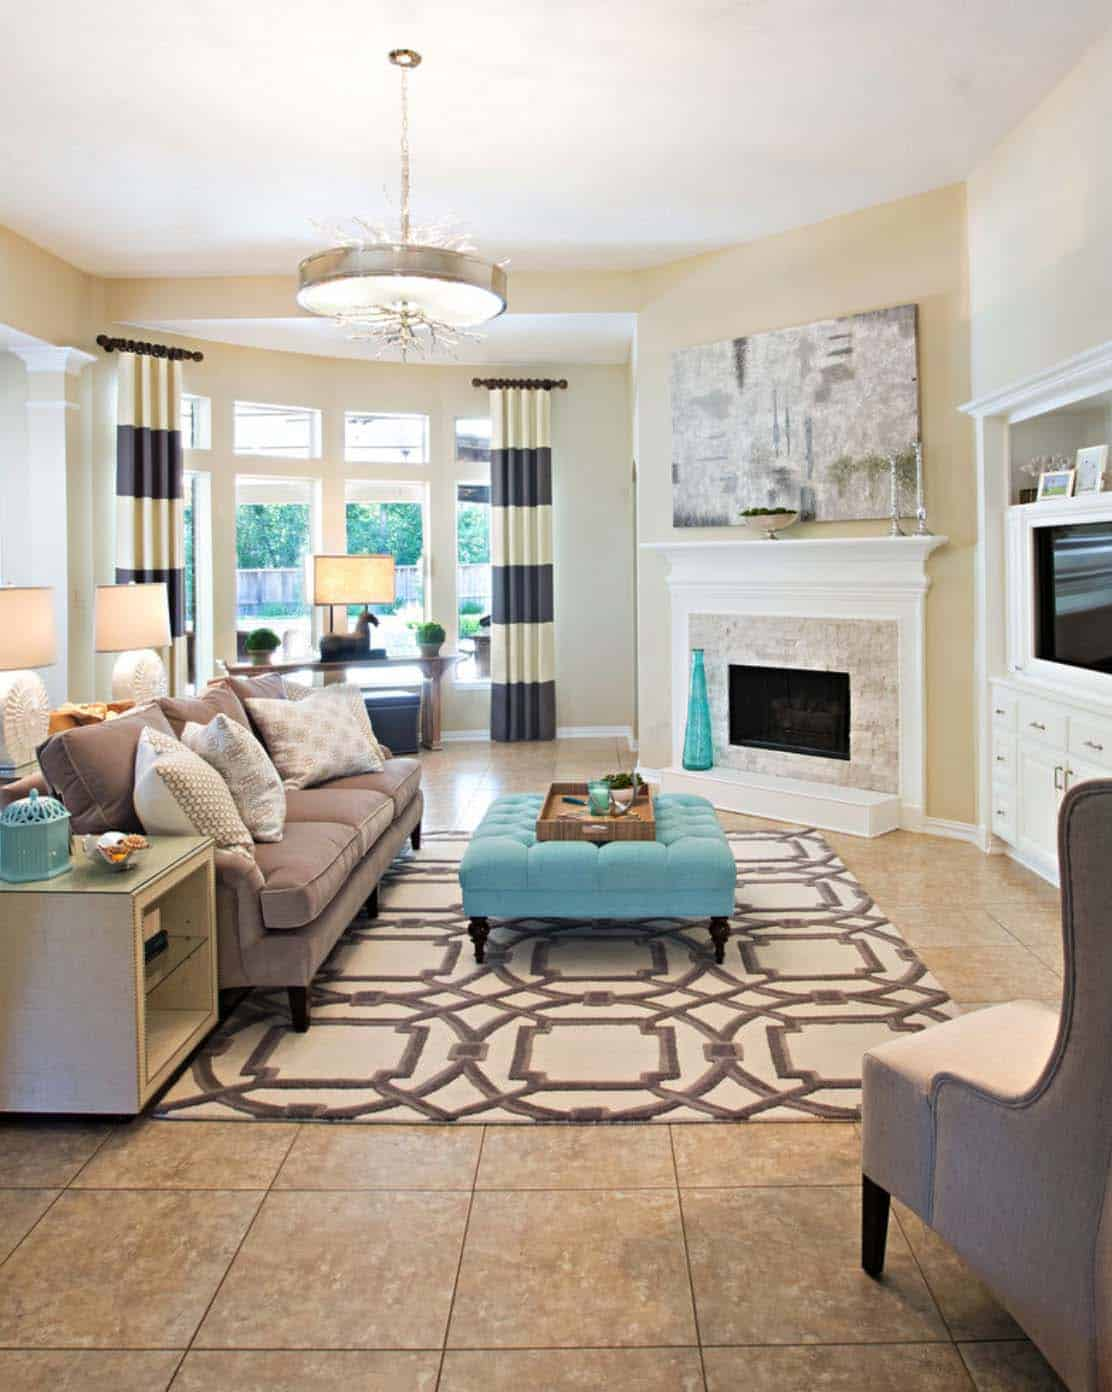 Image Result For Open Plan Living Room Kitchen Design Ideasa